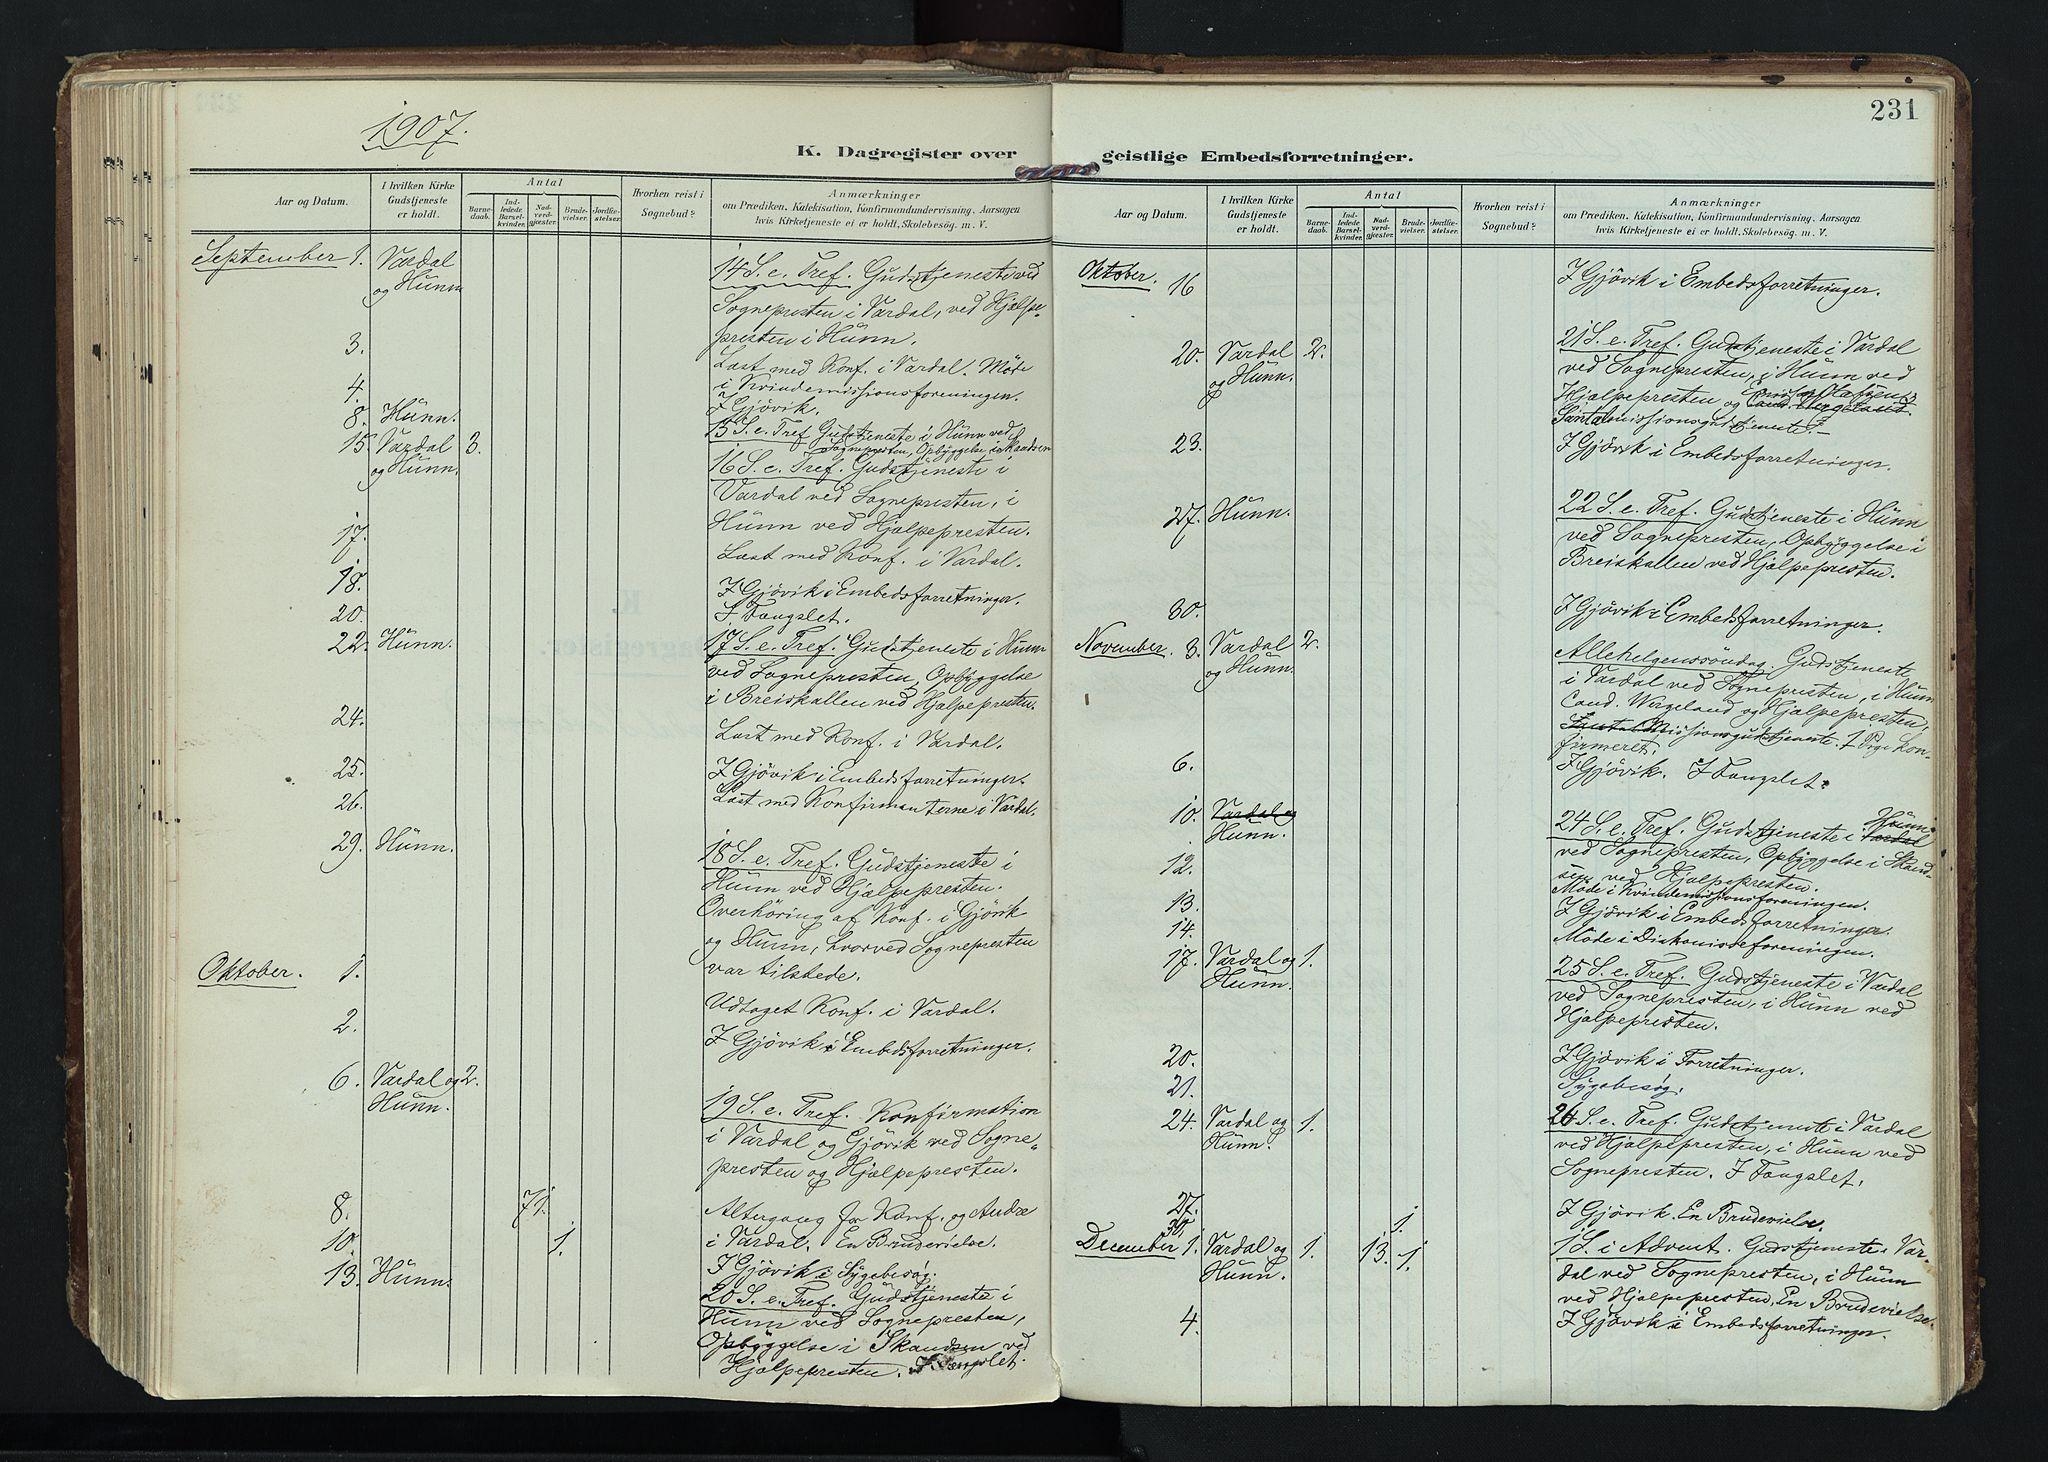 SAH, Vardal prestekontor, H/Ha/Haa/L0020: Ministerialbok nr. 20, 1907-1921, s. 231